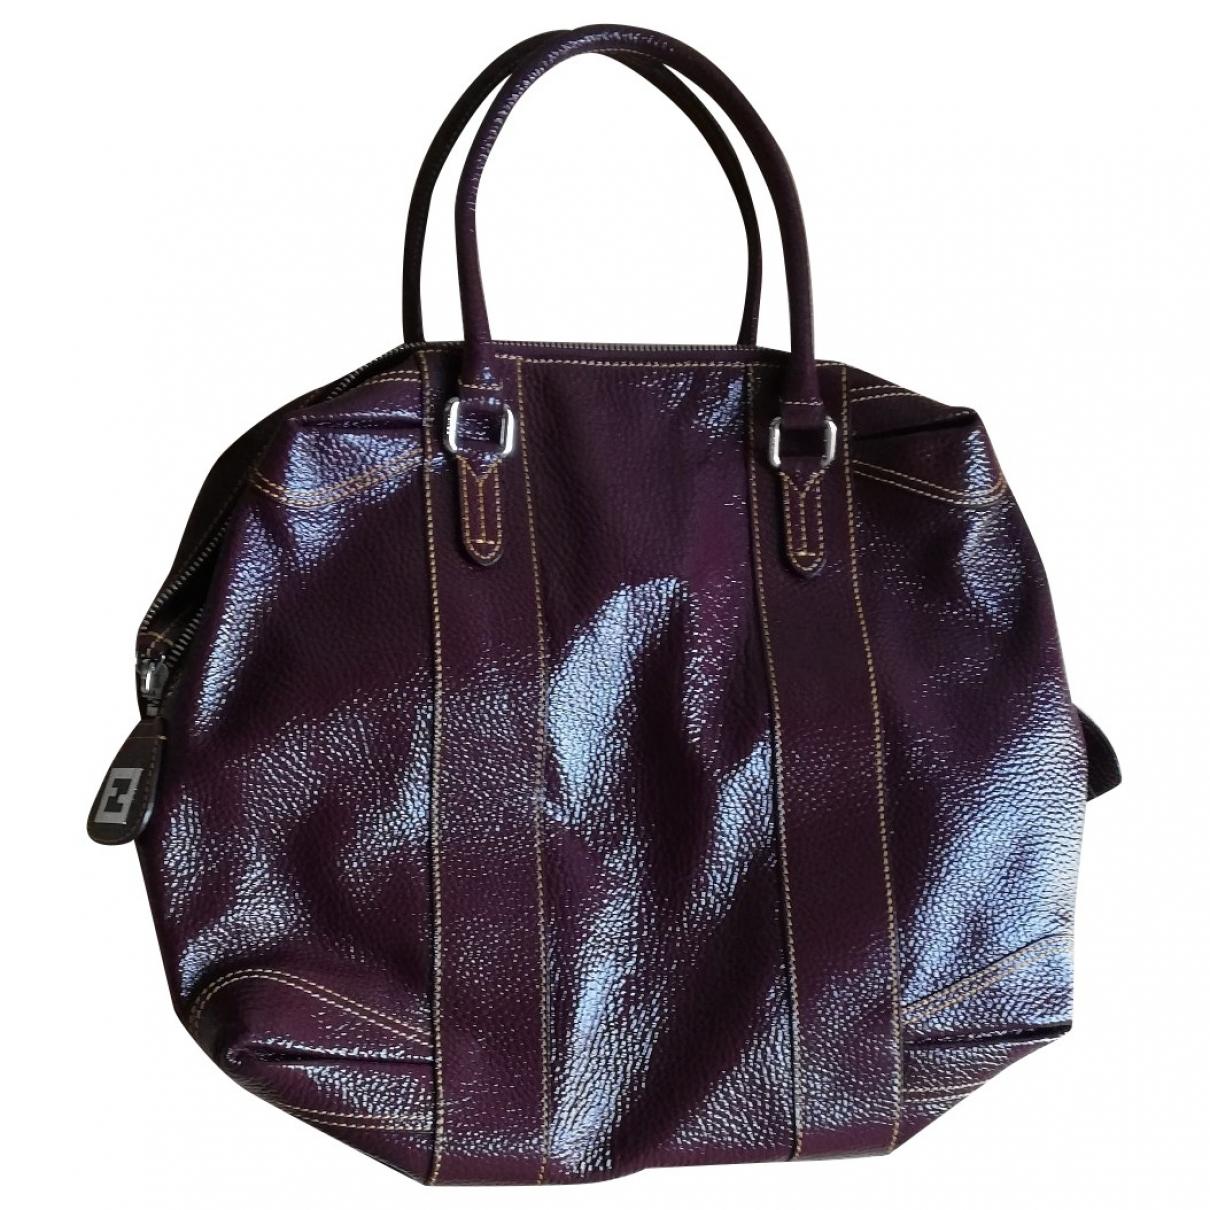 Fendi \N Burgundy Patent leather handbag for Women \N